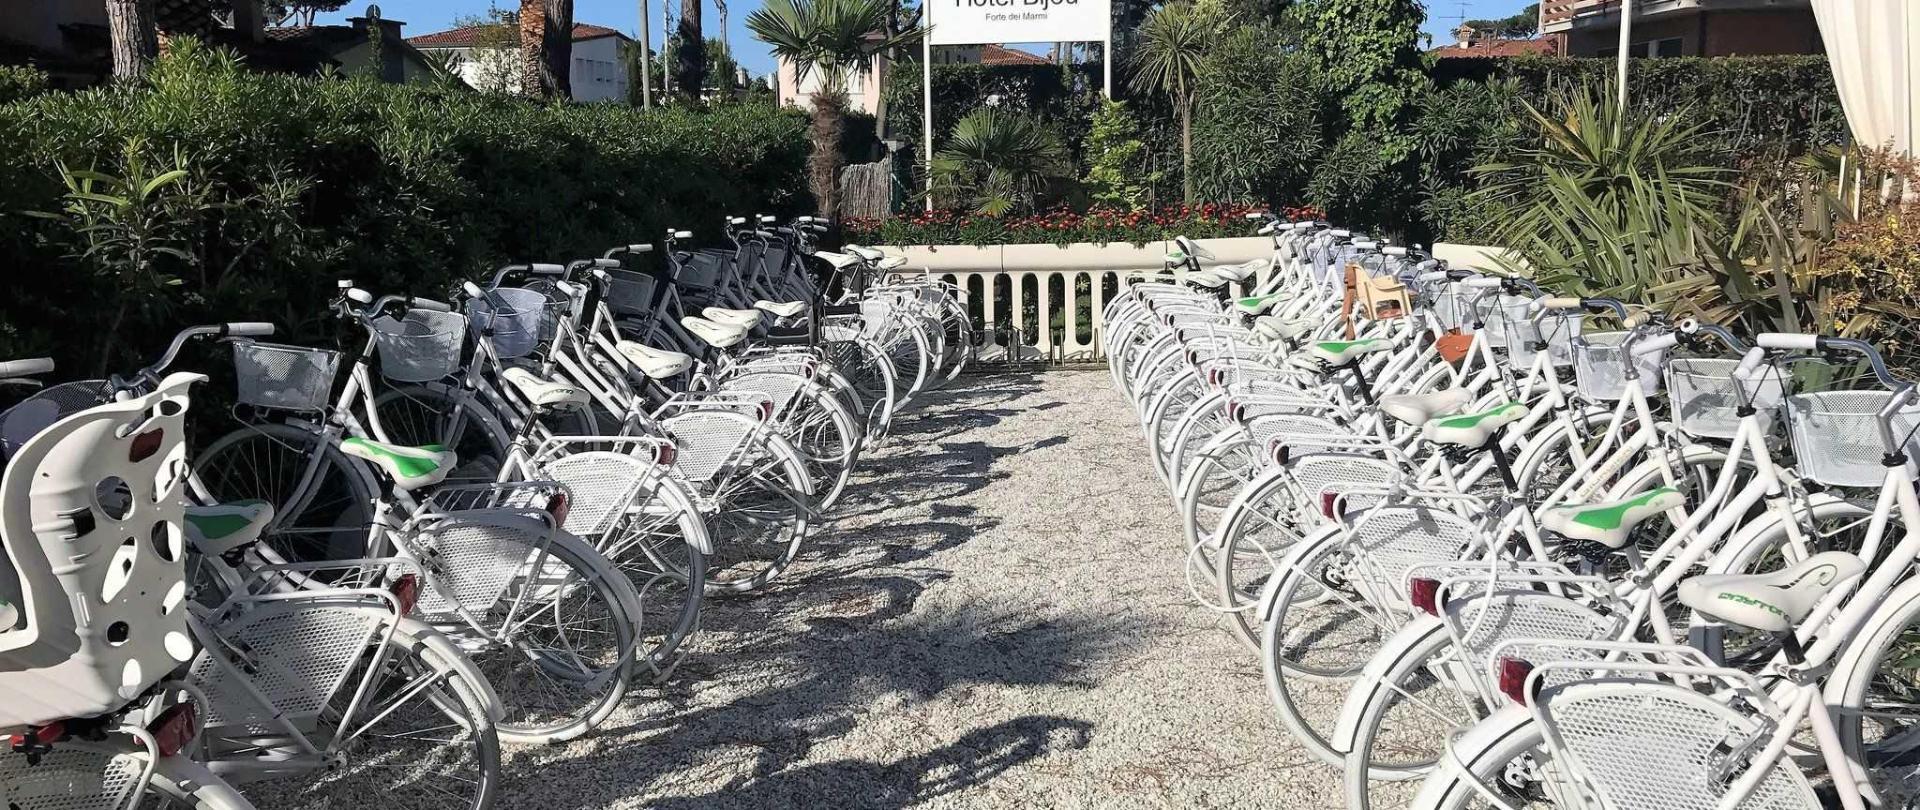 biciclette-1.JPG